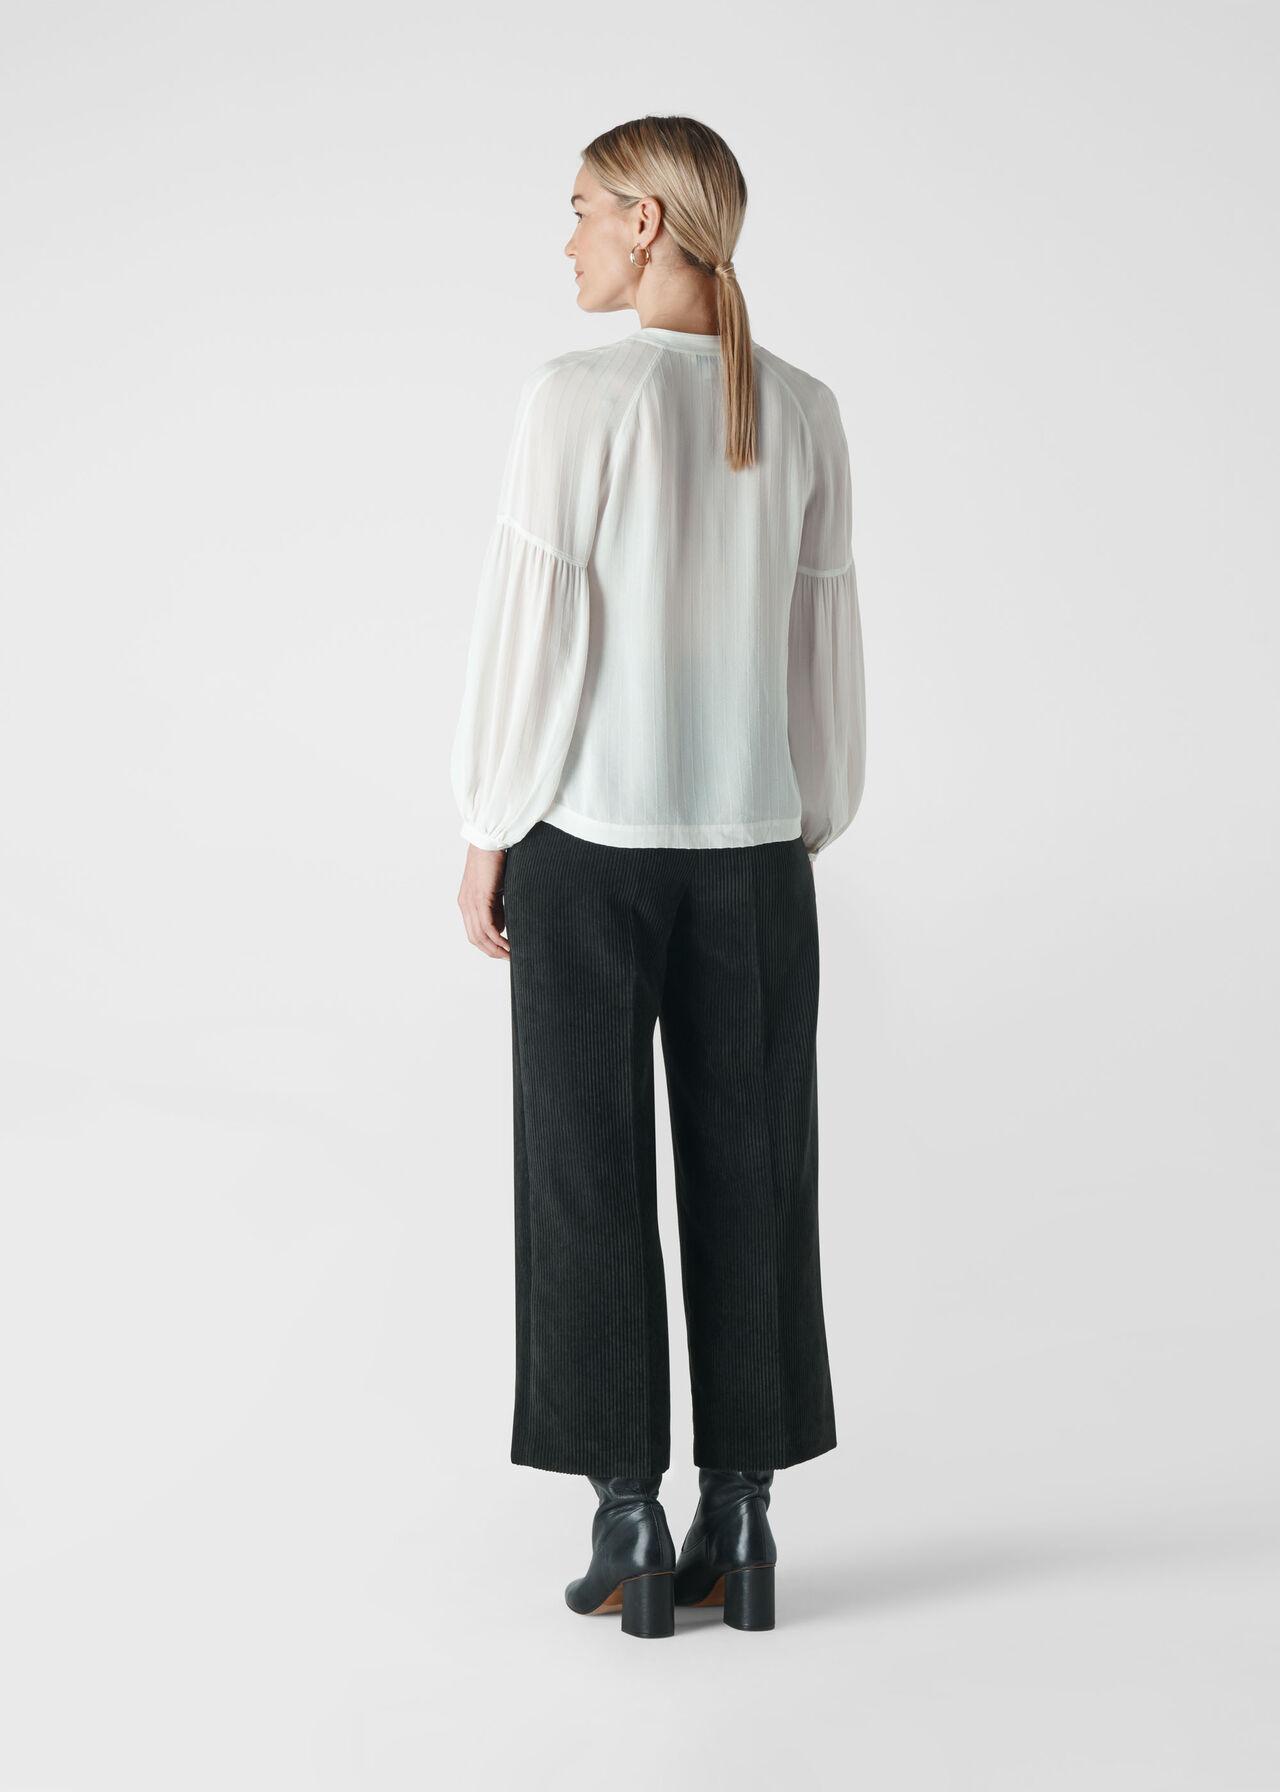 Cristen Stripe Blouse Ivory/Multi